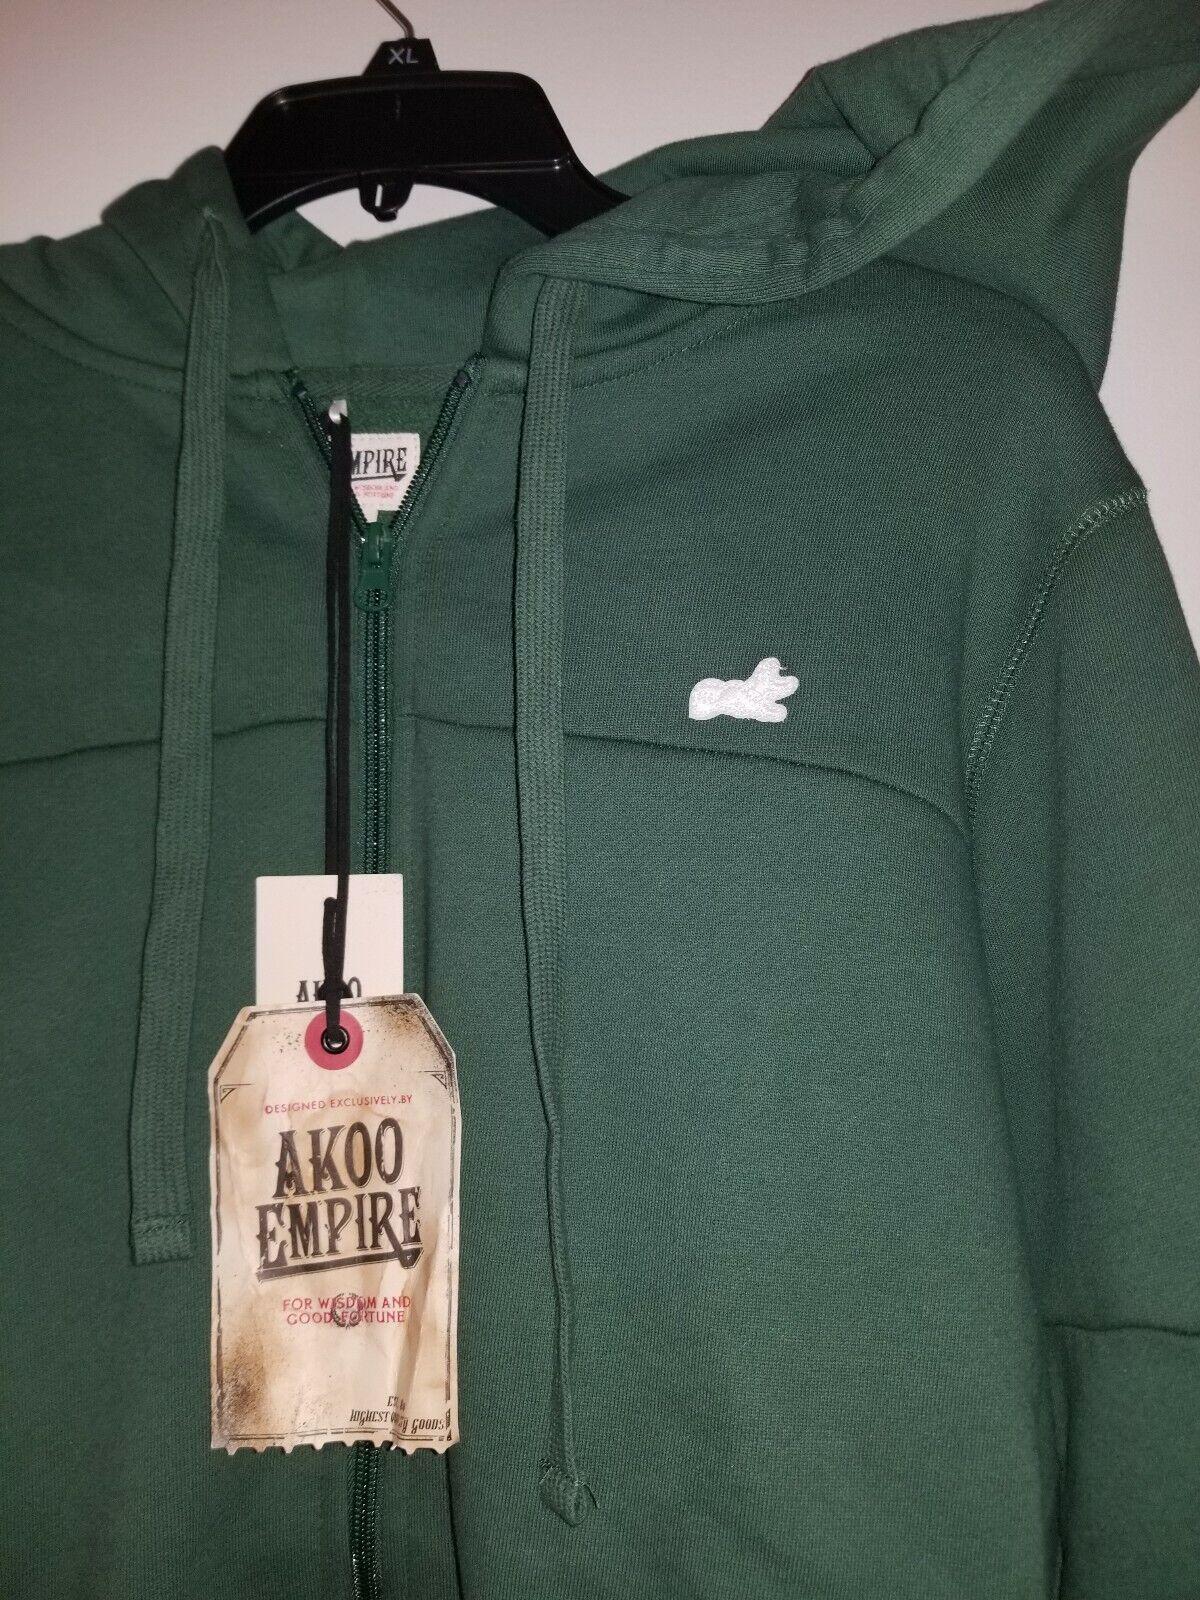 Akoo Jacket Hoodie Brand New Grün Größe 3XLARGE  80.00